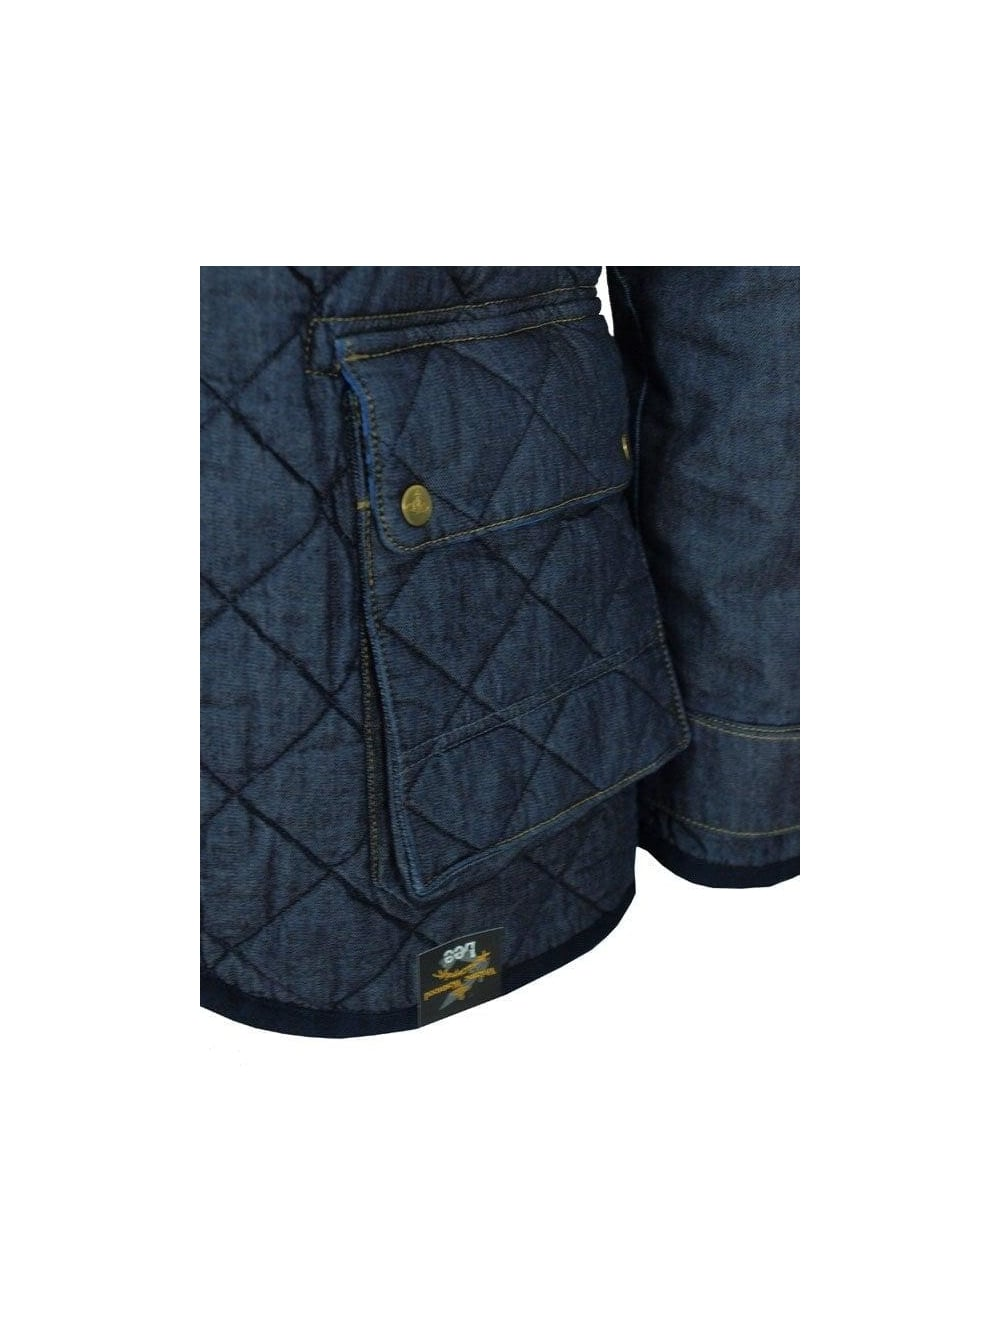 Vivienne Westwood Hunting Quilted Jacket In Rinse Blue Northern